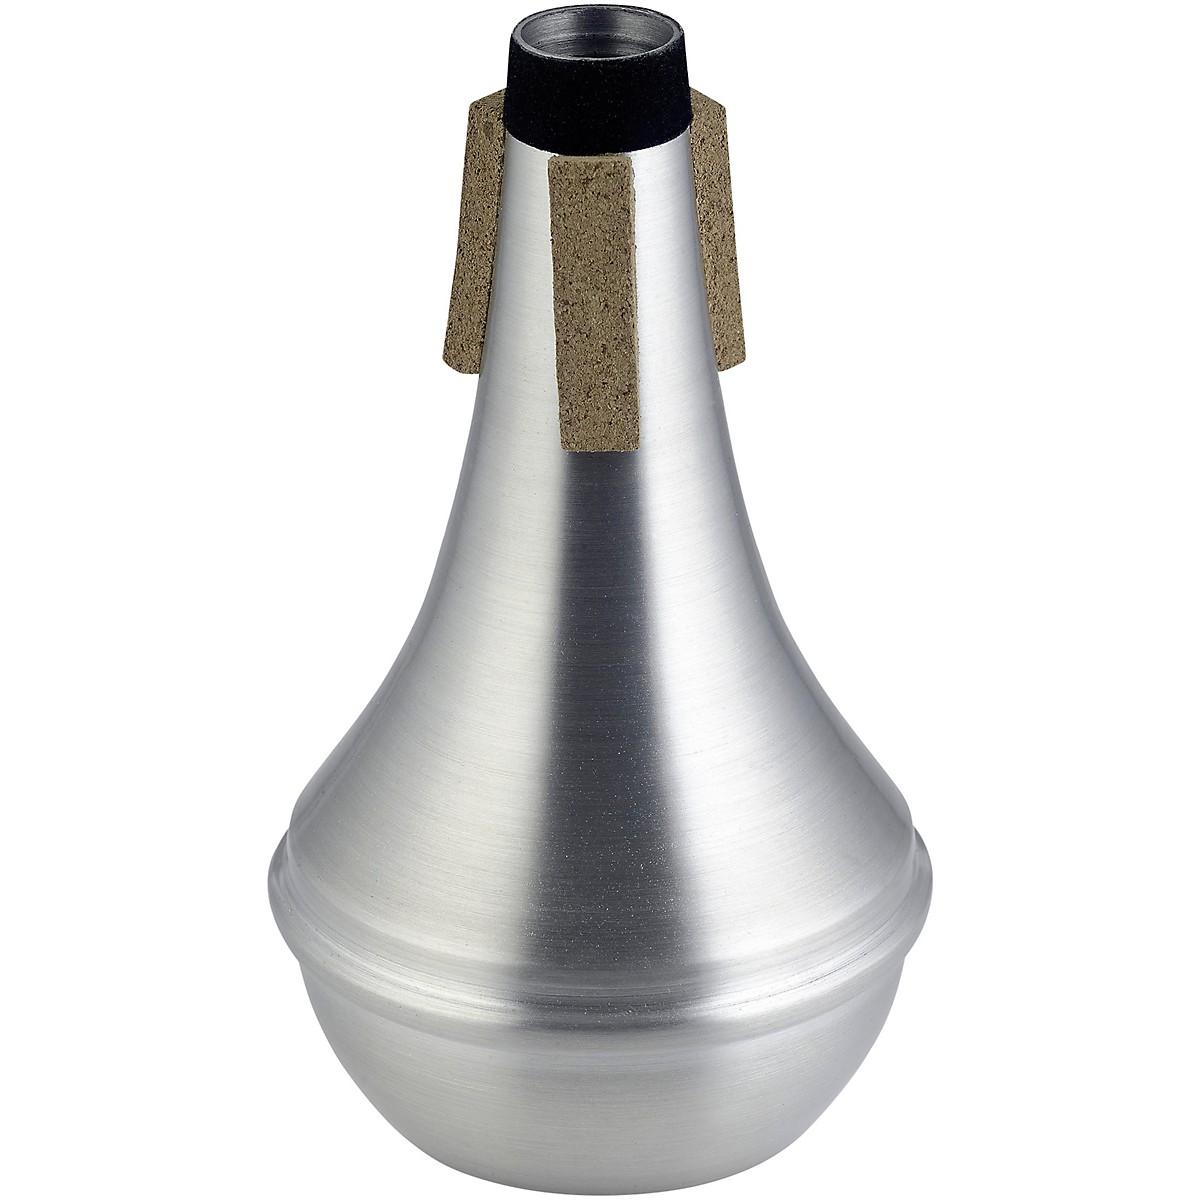 Stagg Aluminium Straight Mute for Trumpet